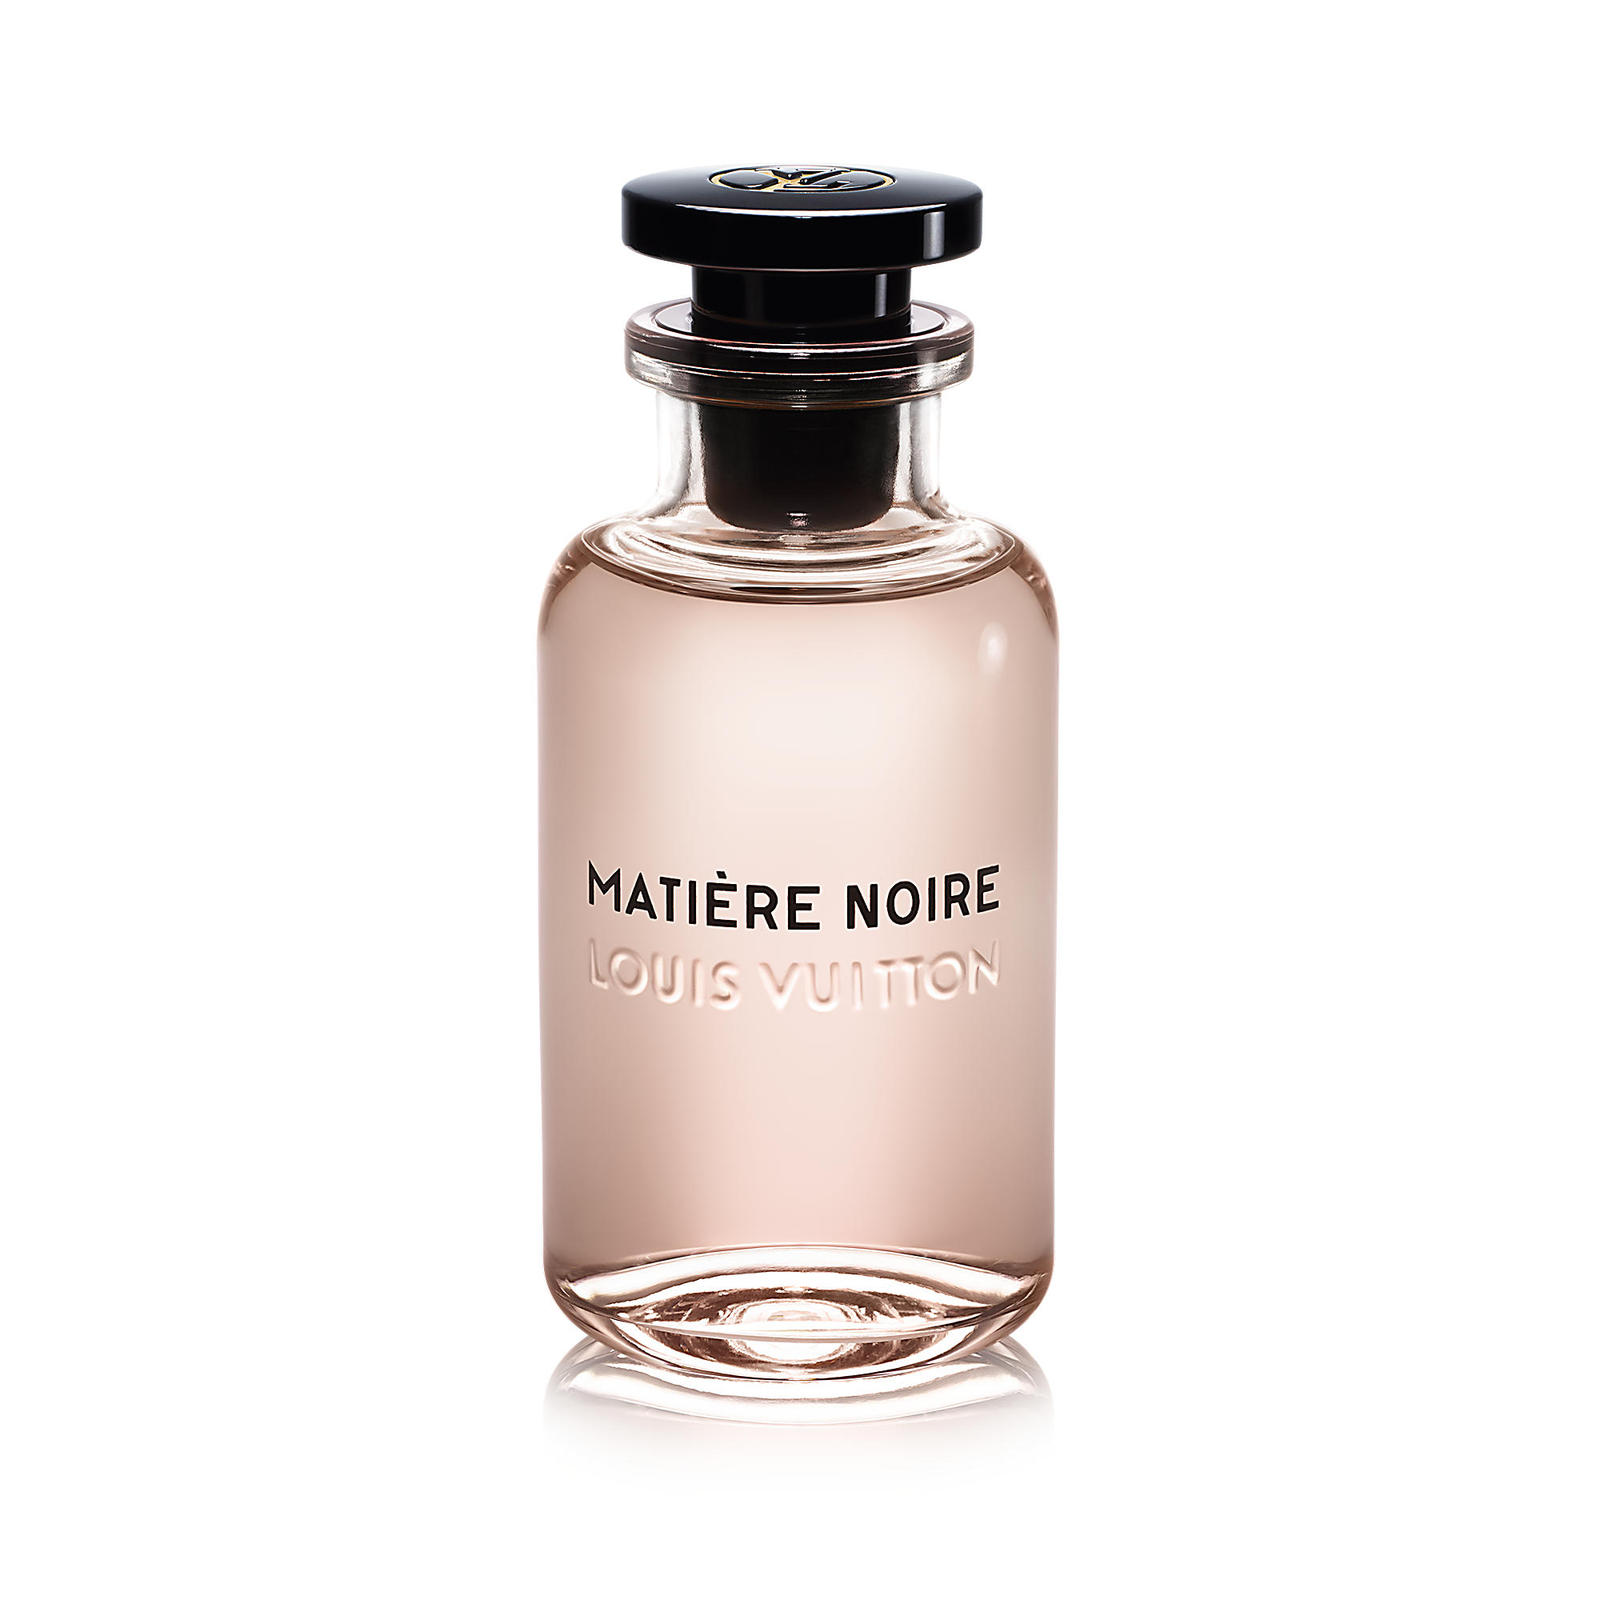 MATIERE NOIRE by LOUIS VUITTON 5ml Travel Spray Perfume OUD CYCLAMEN PATCHOULI